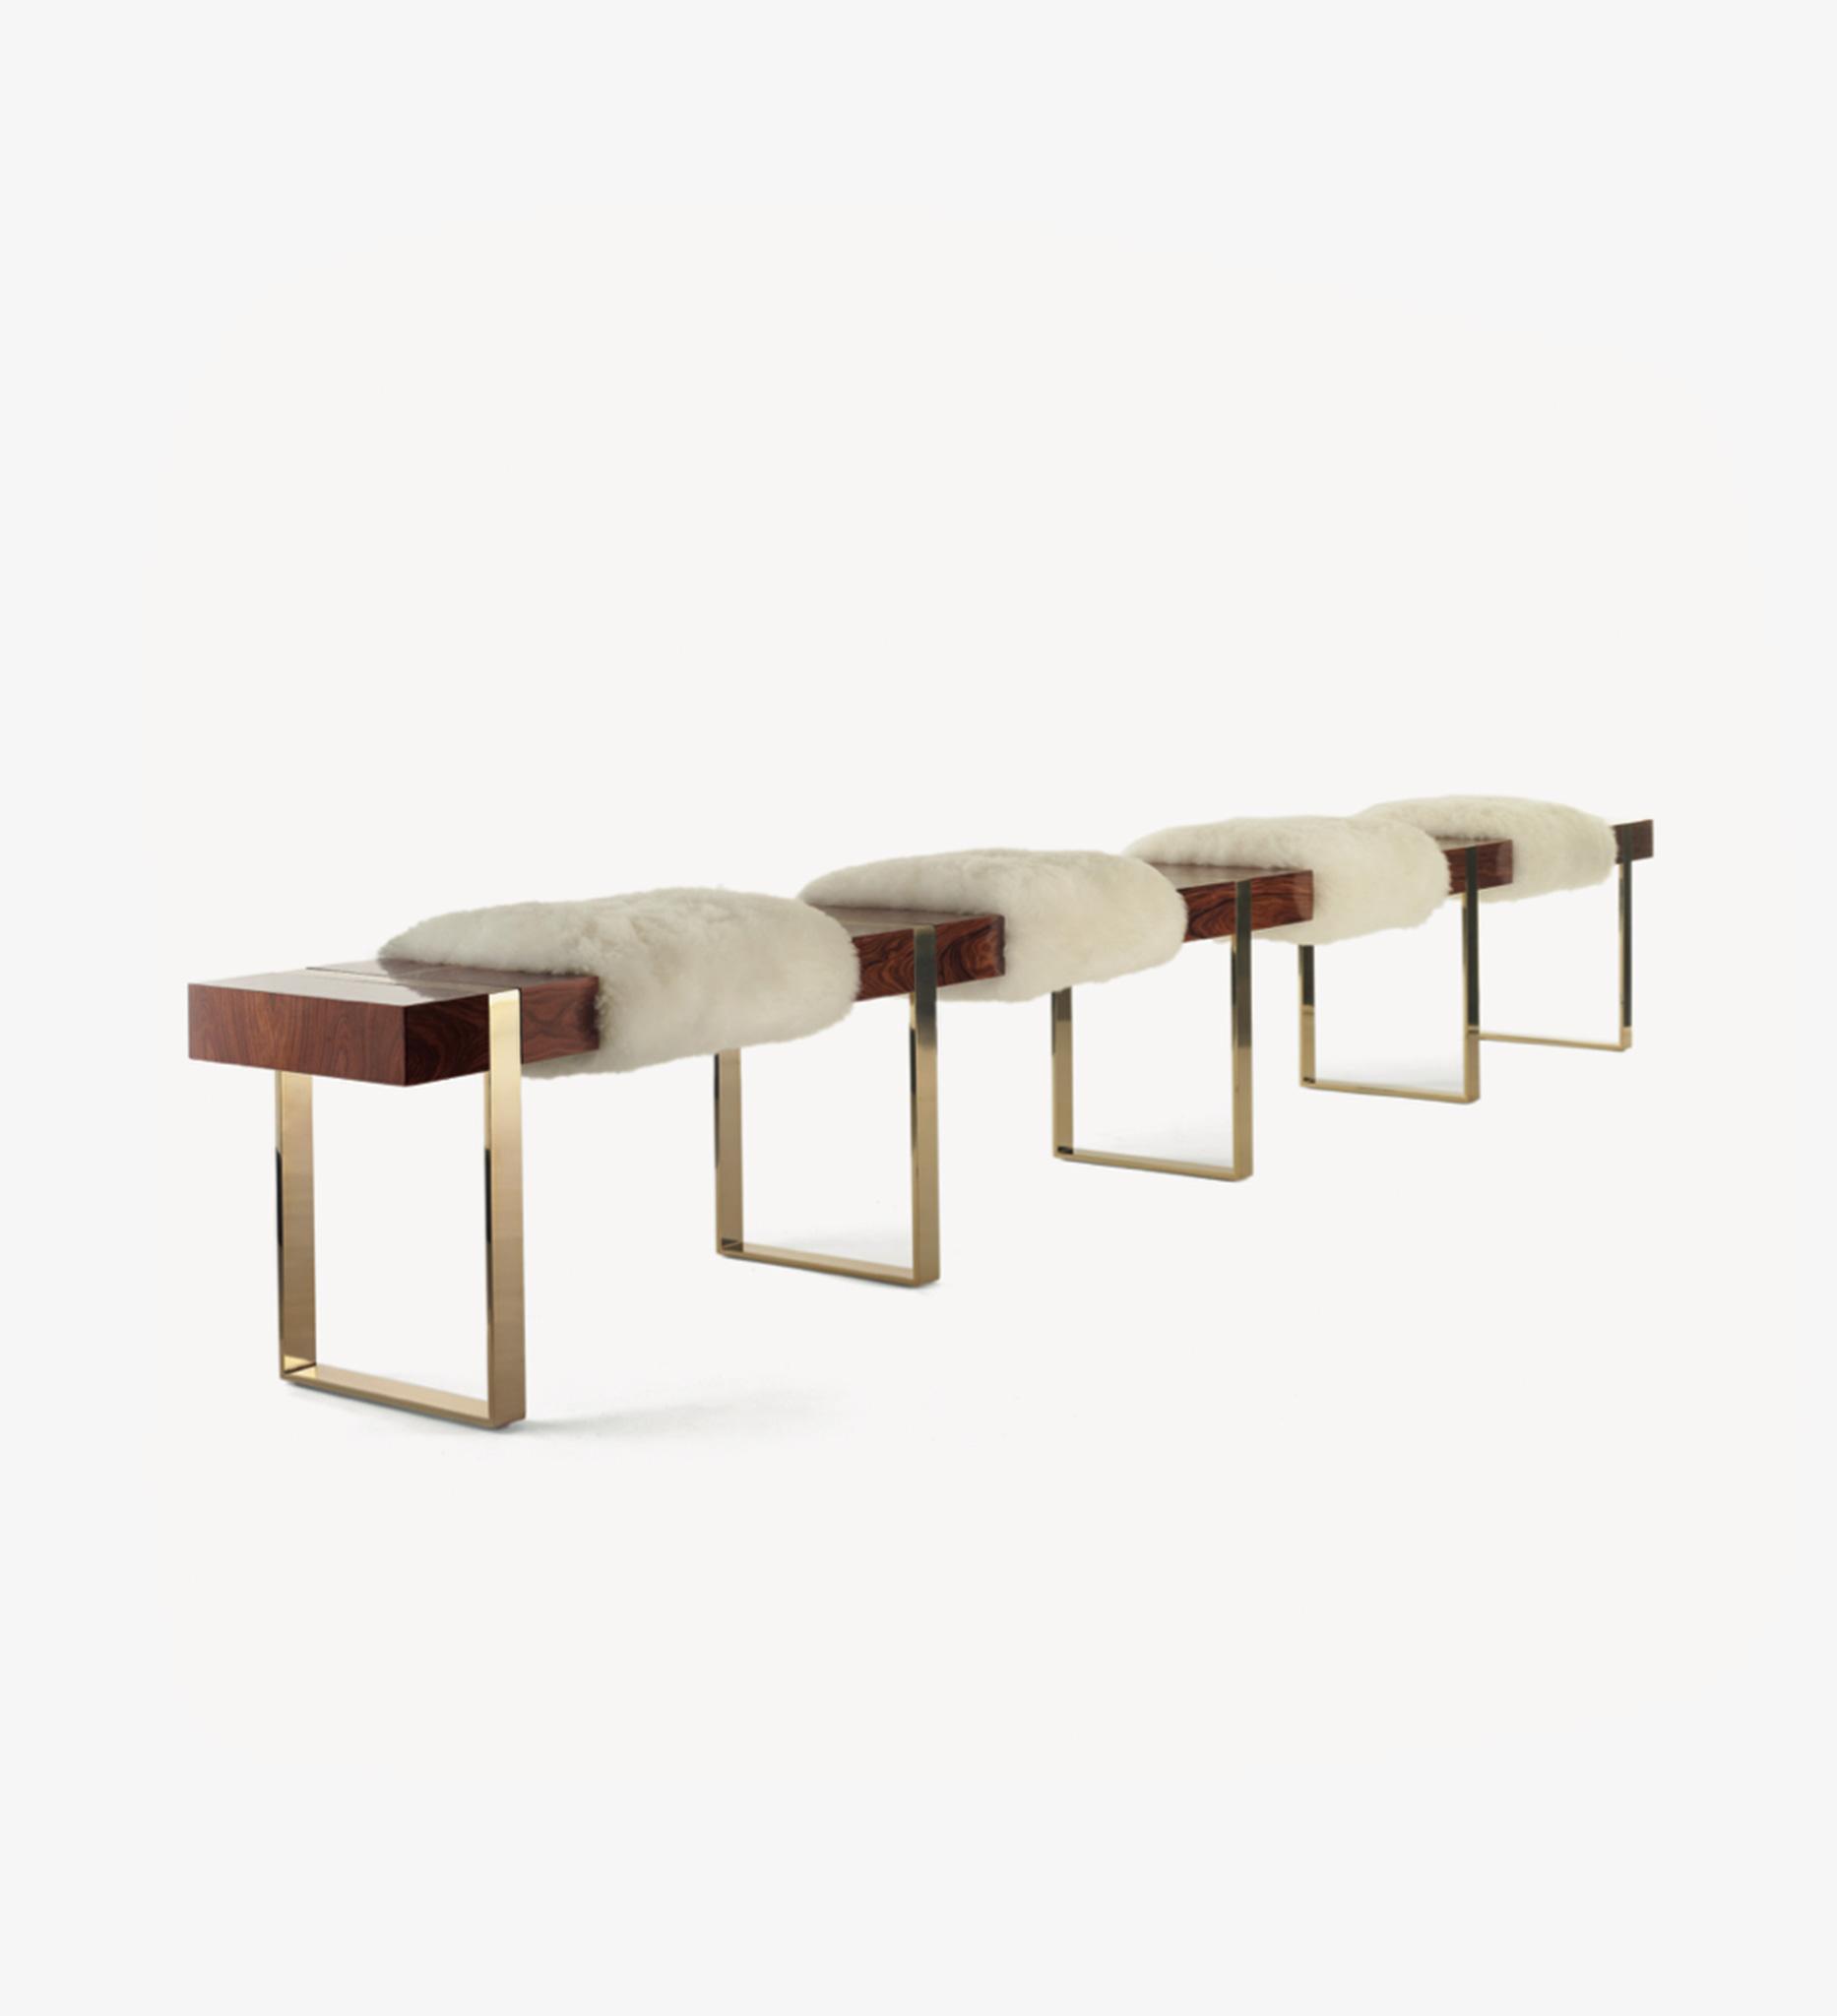 bench, shearling, wood, brass